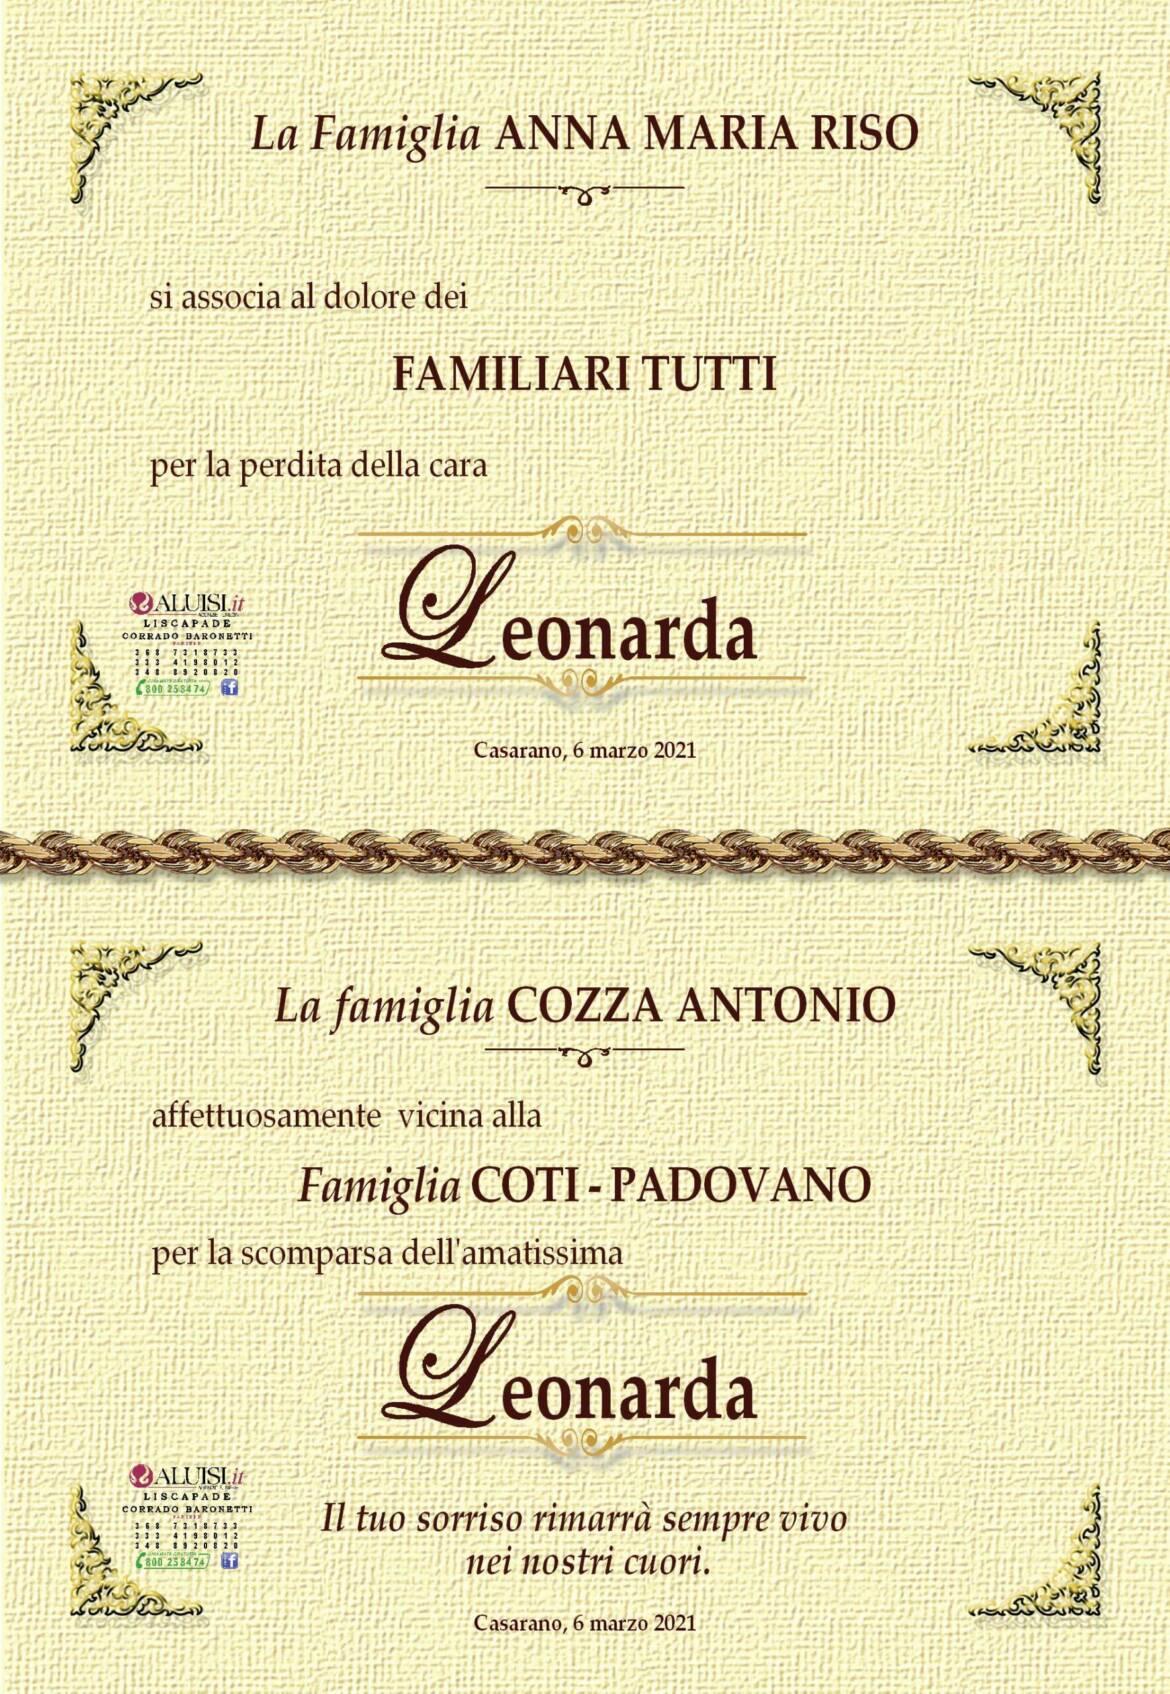 PARTECIPAZIONI-Leonarda-Padovano-Casarano-1-scaled.jpg